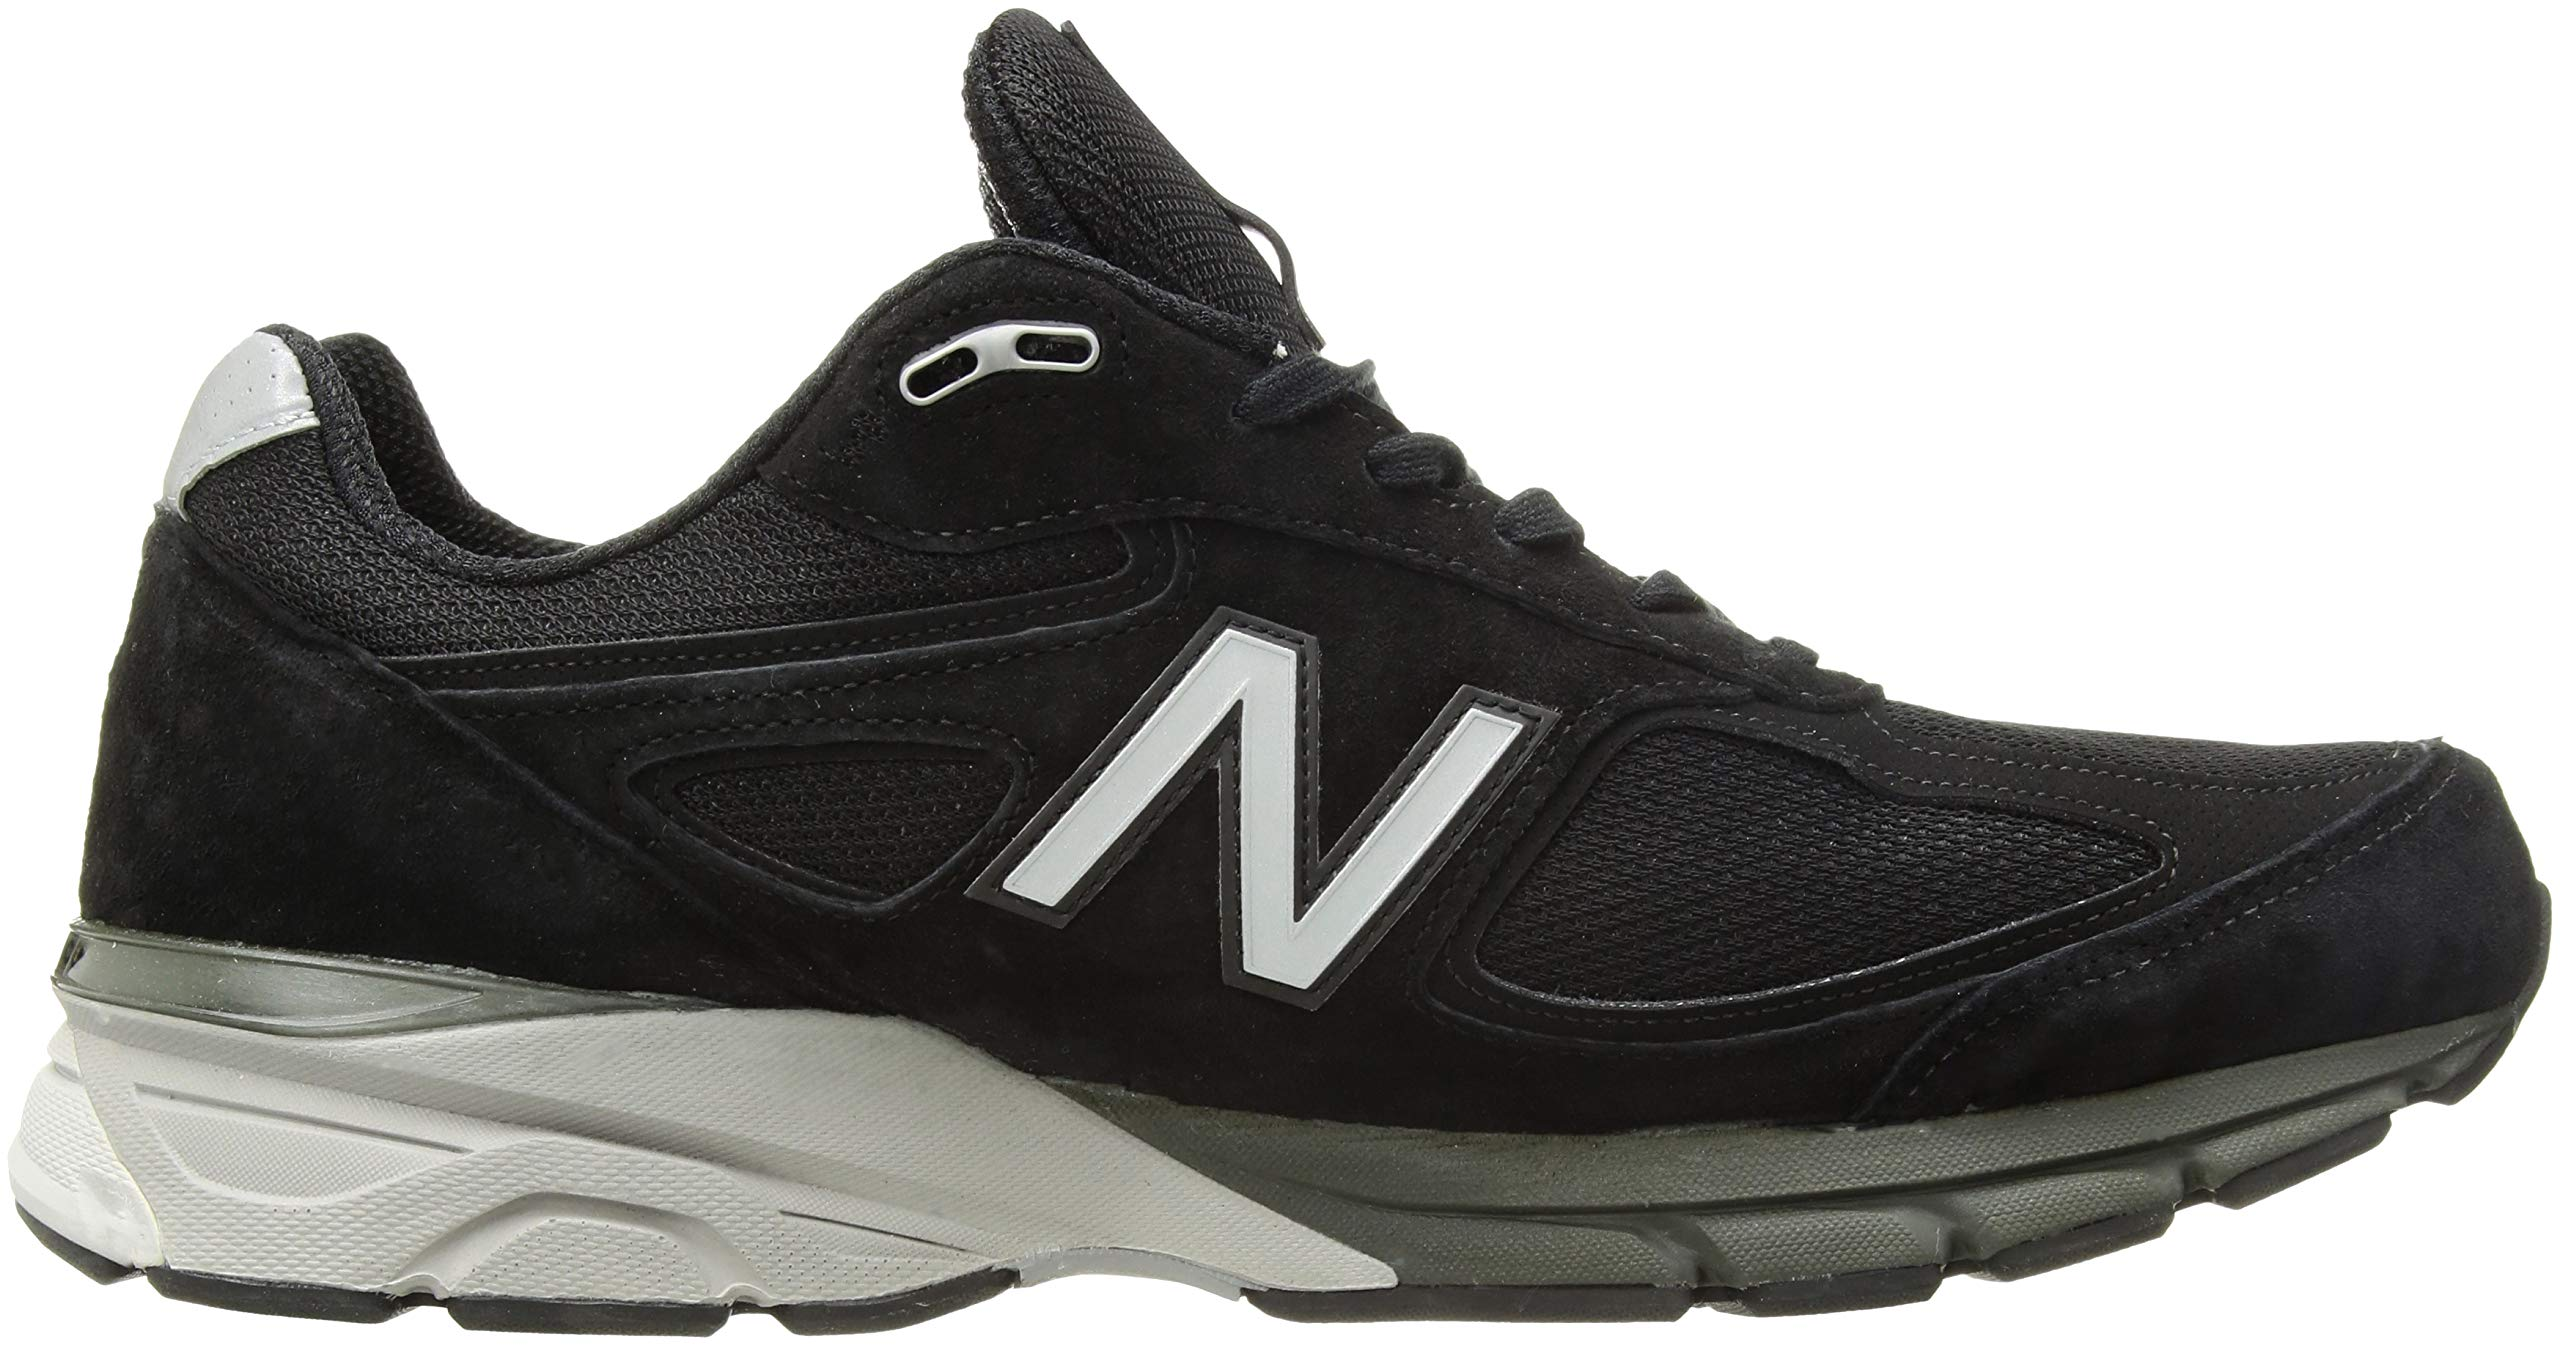 81IMqaQDEdL - New Balance Mens M990 990v4 Black Size: 7.5 Wide